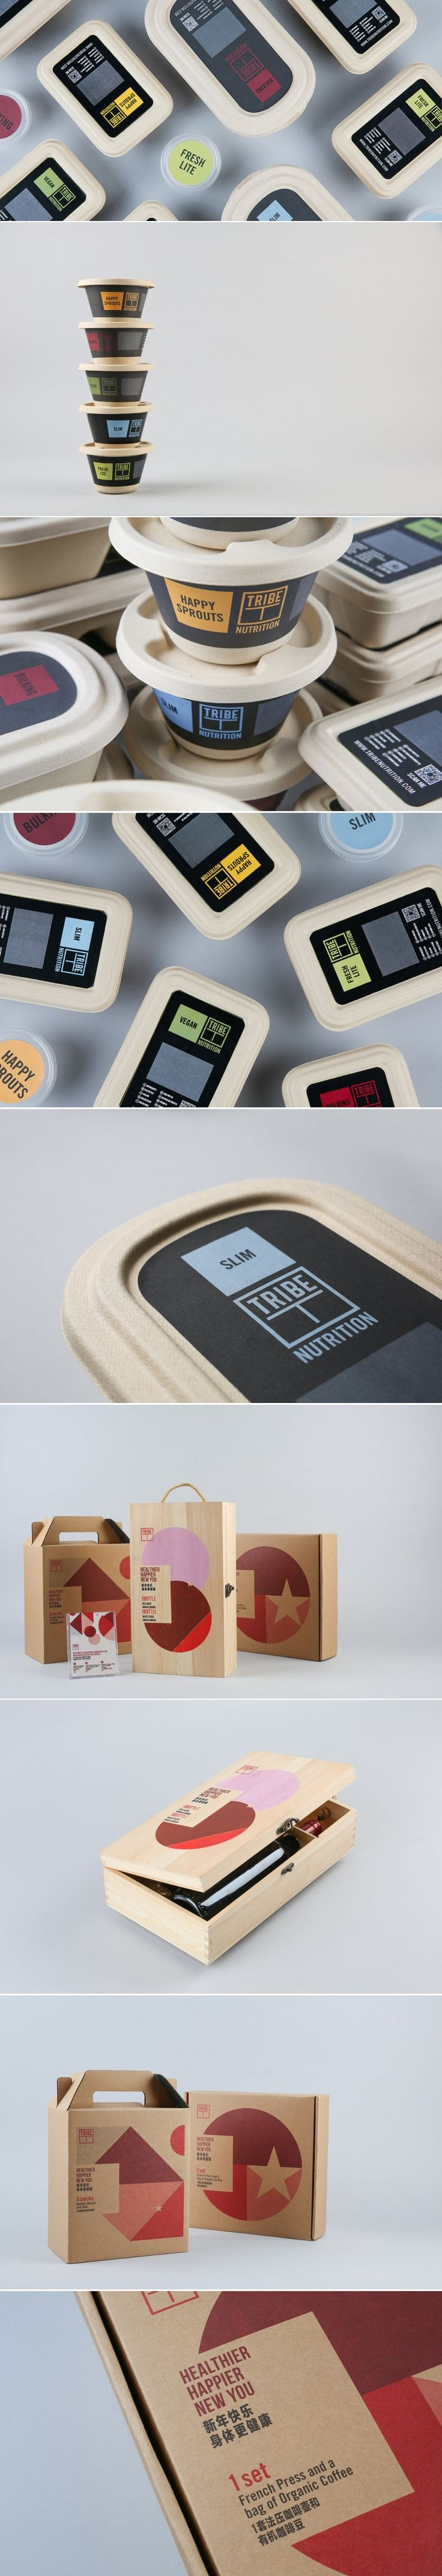 Tribe Organic Foods — The Dieline | Packaging & Branding Design & Innovation News